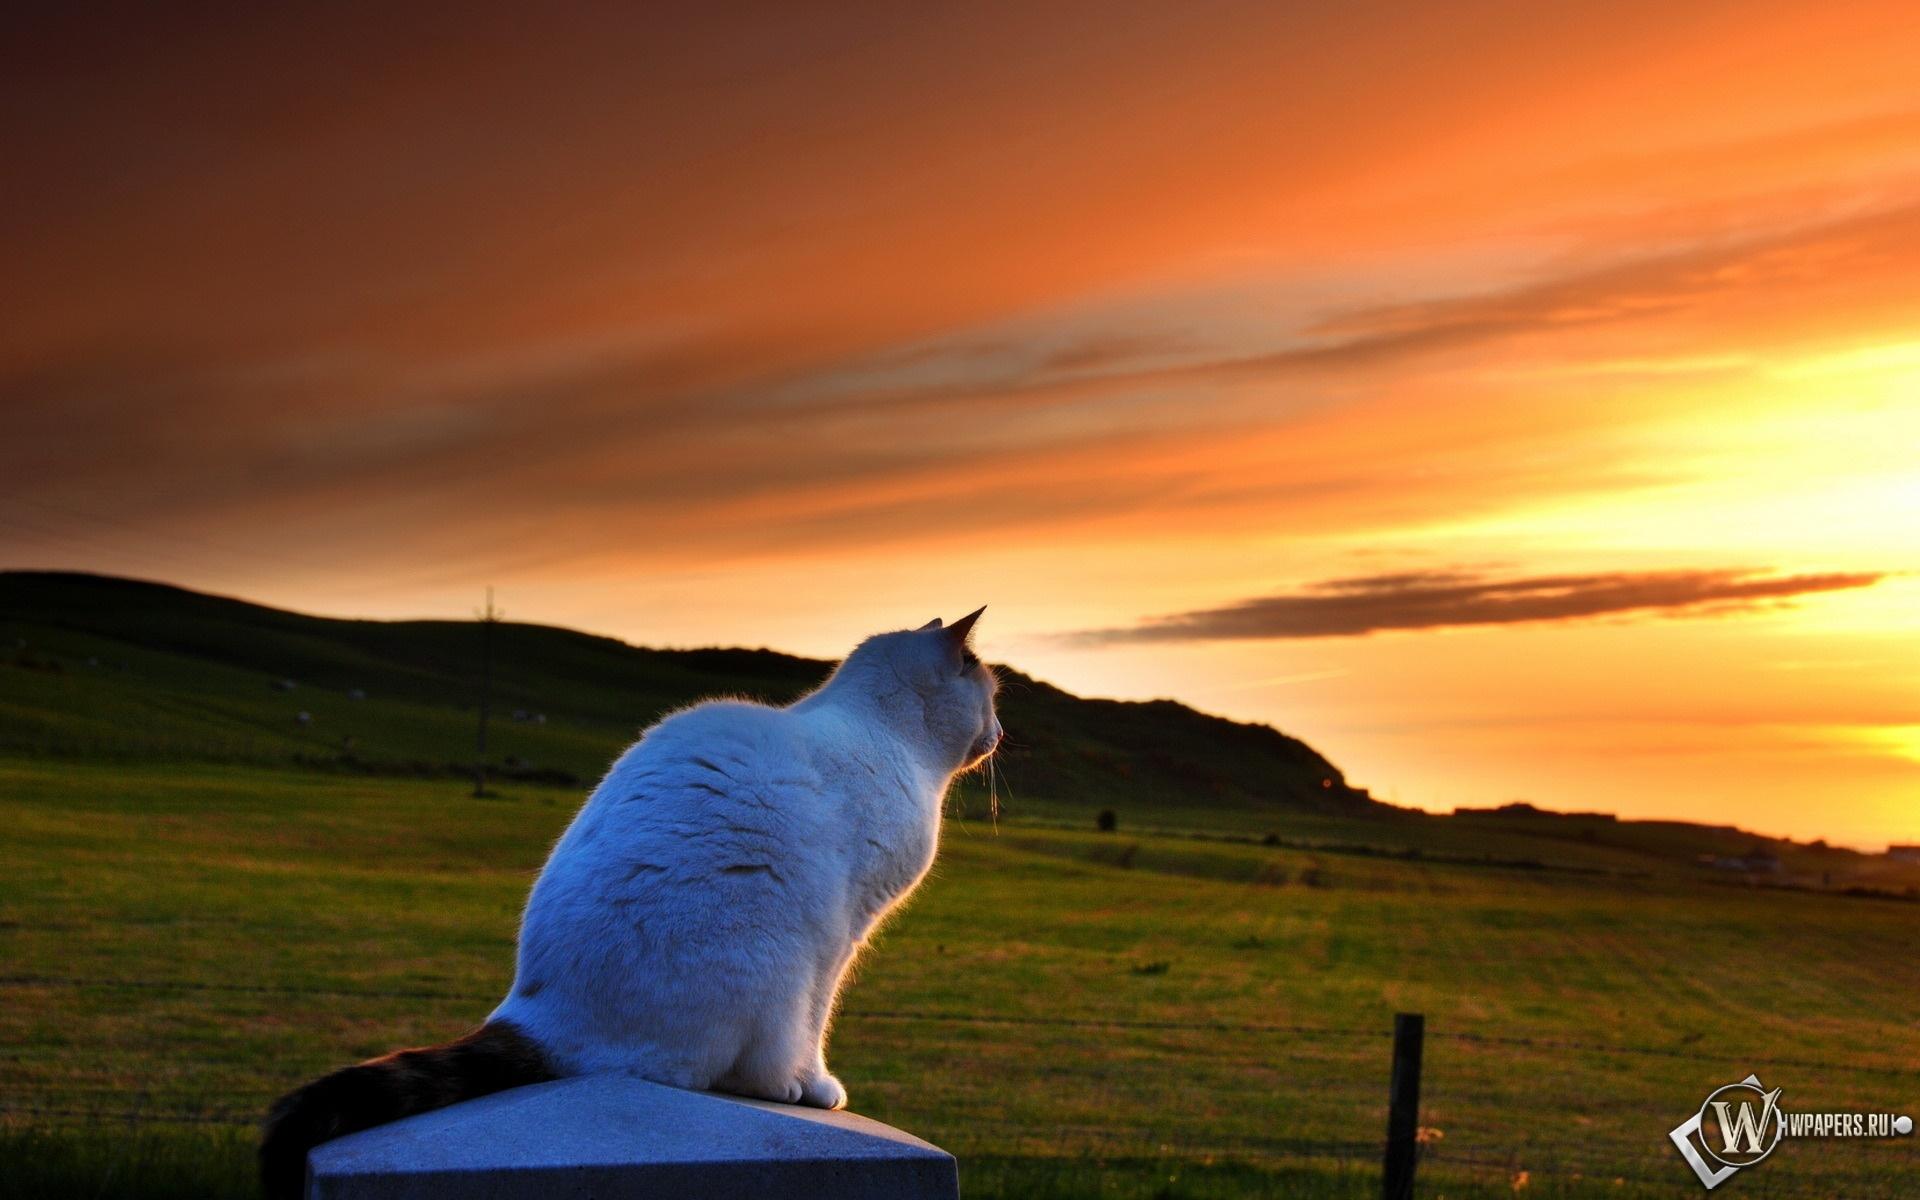 Кошка любуется закатом 1920x1200